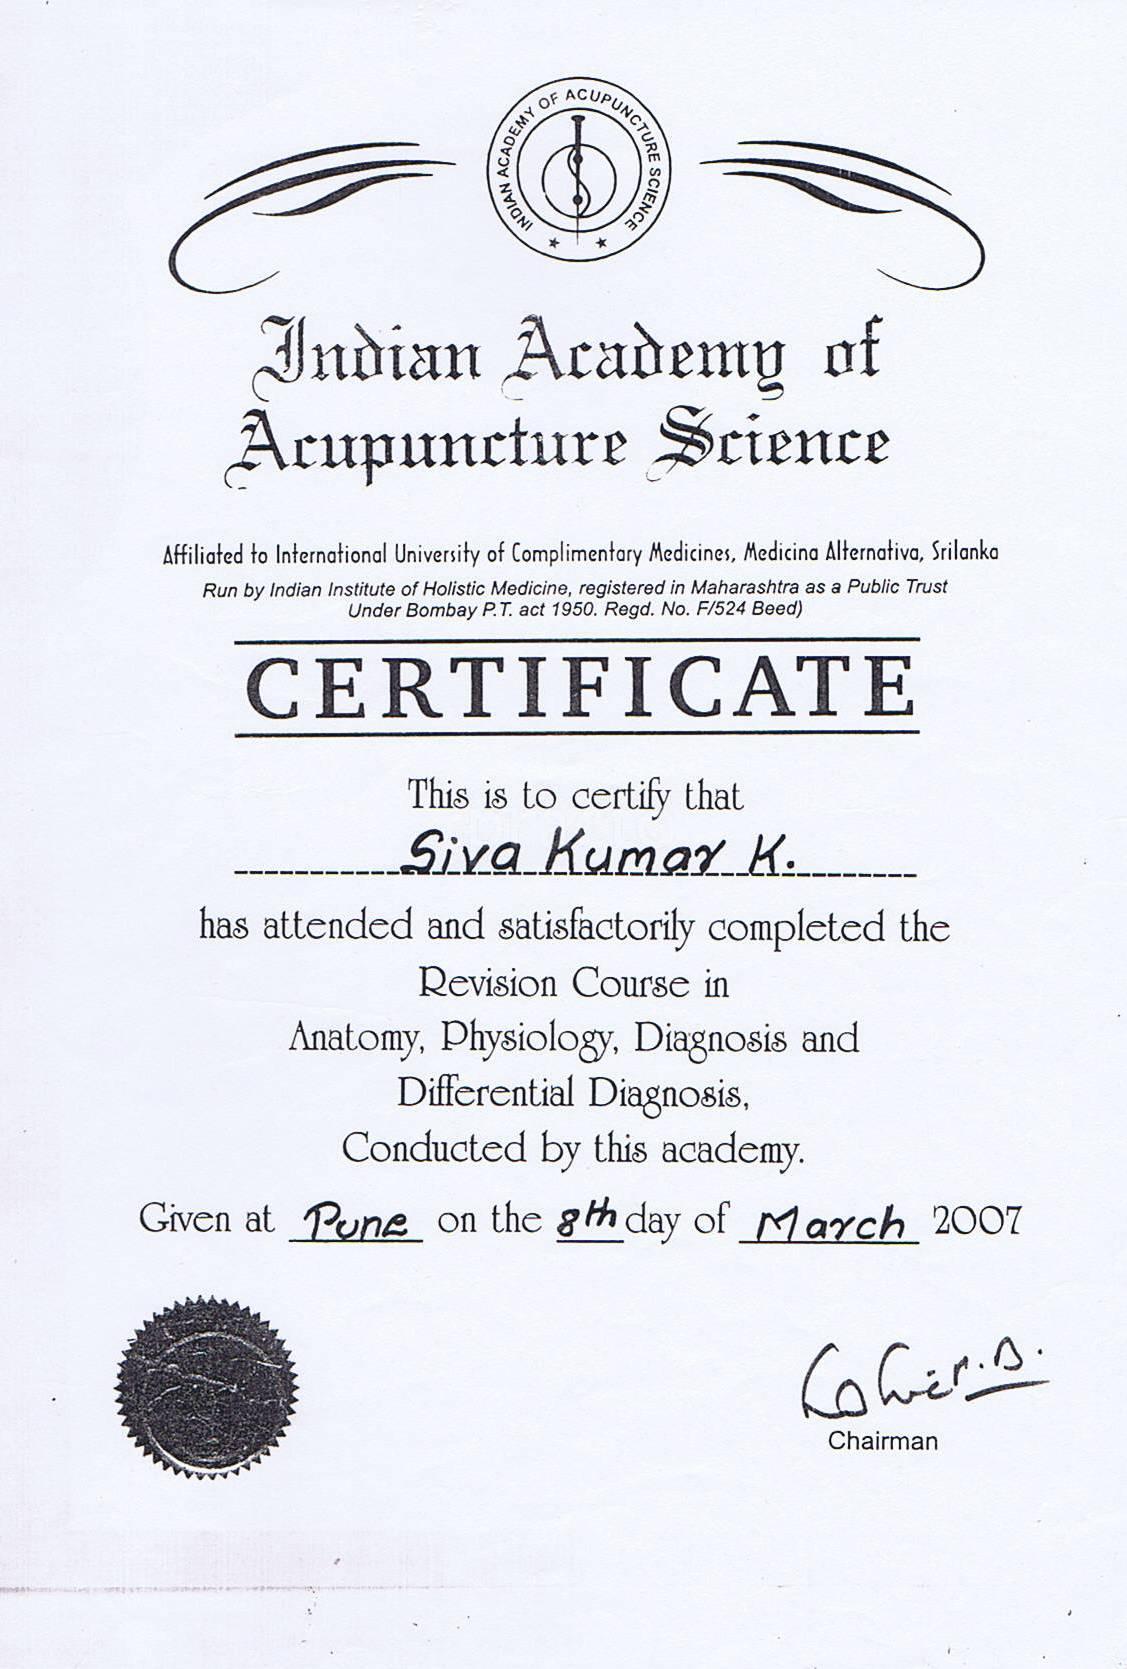 Dr  Sivakumar K - Alternative Medicine - Book Appointment